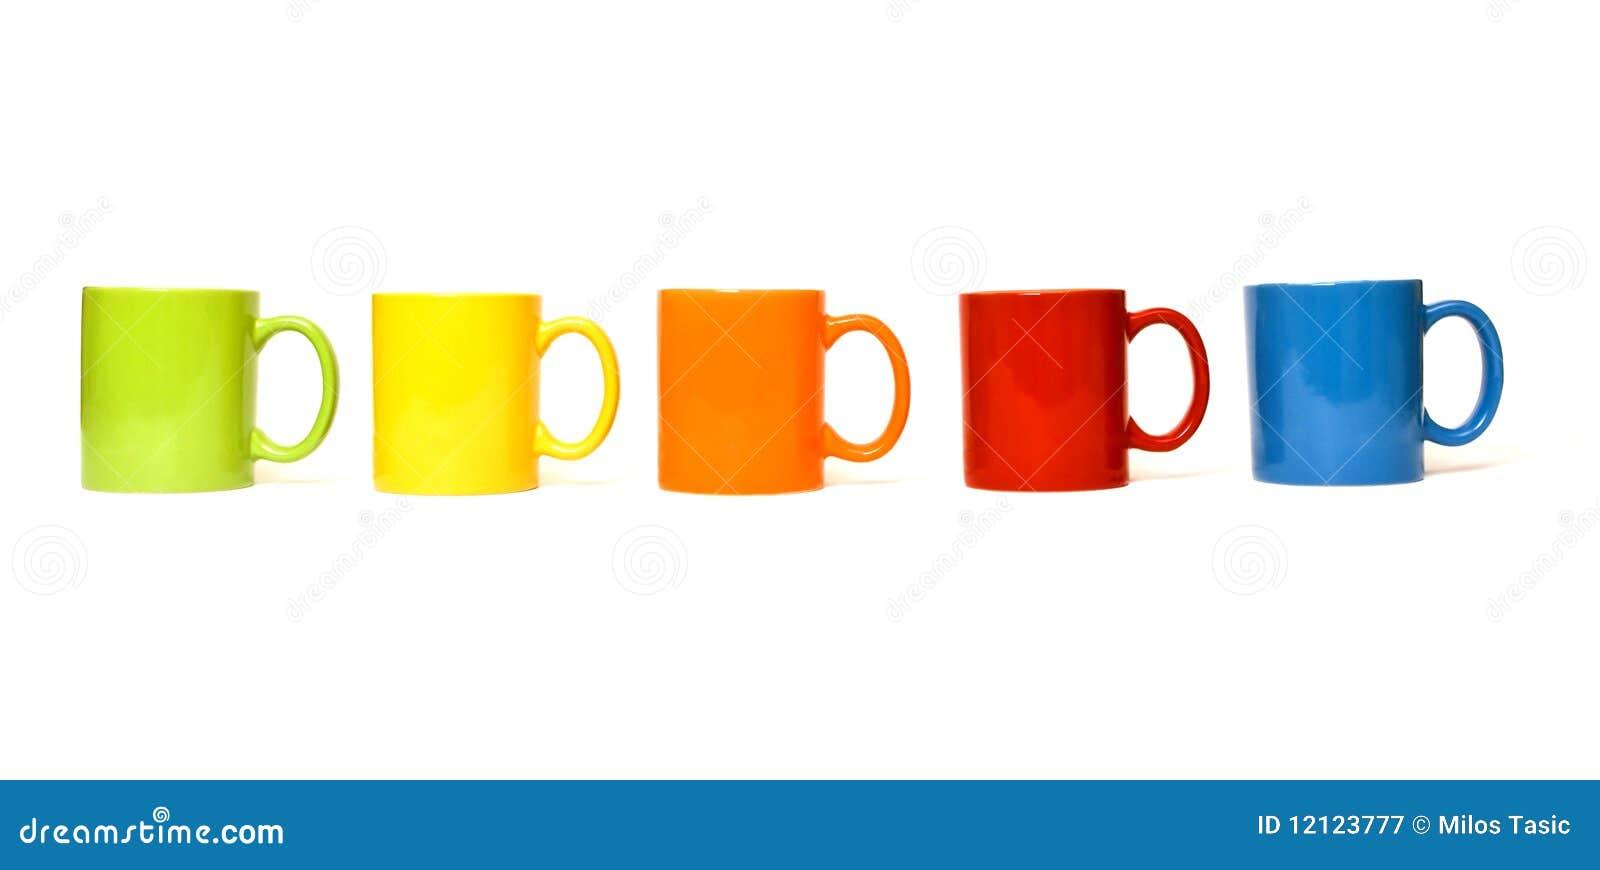 colorful mugs royalty free stock photography - Colorful Mugs